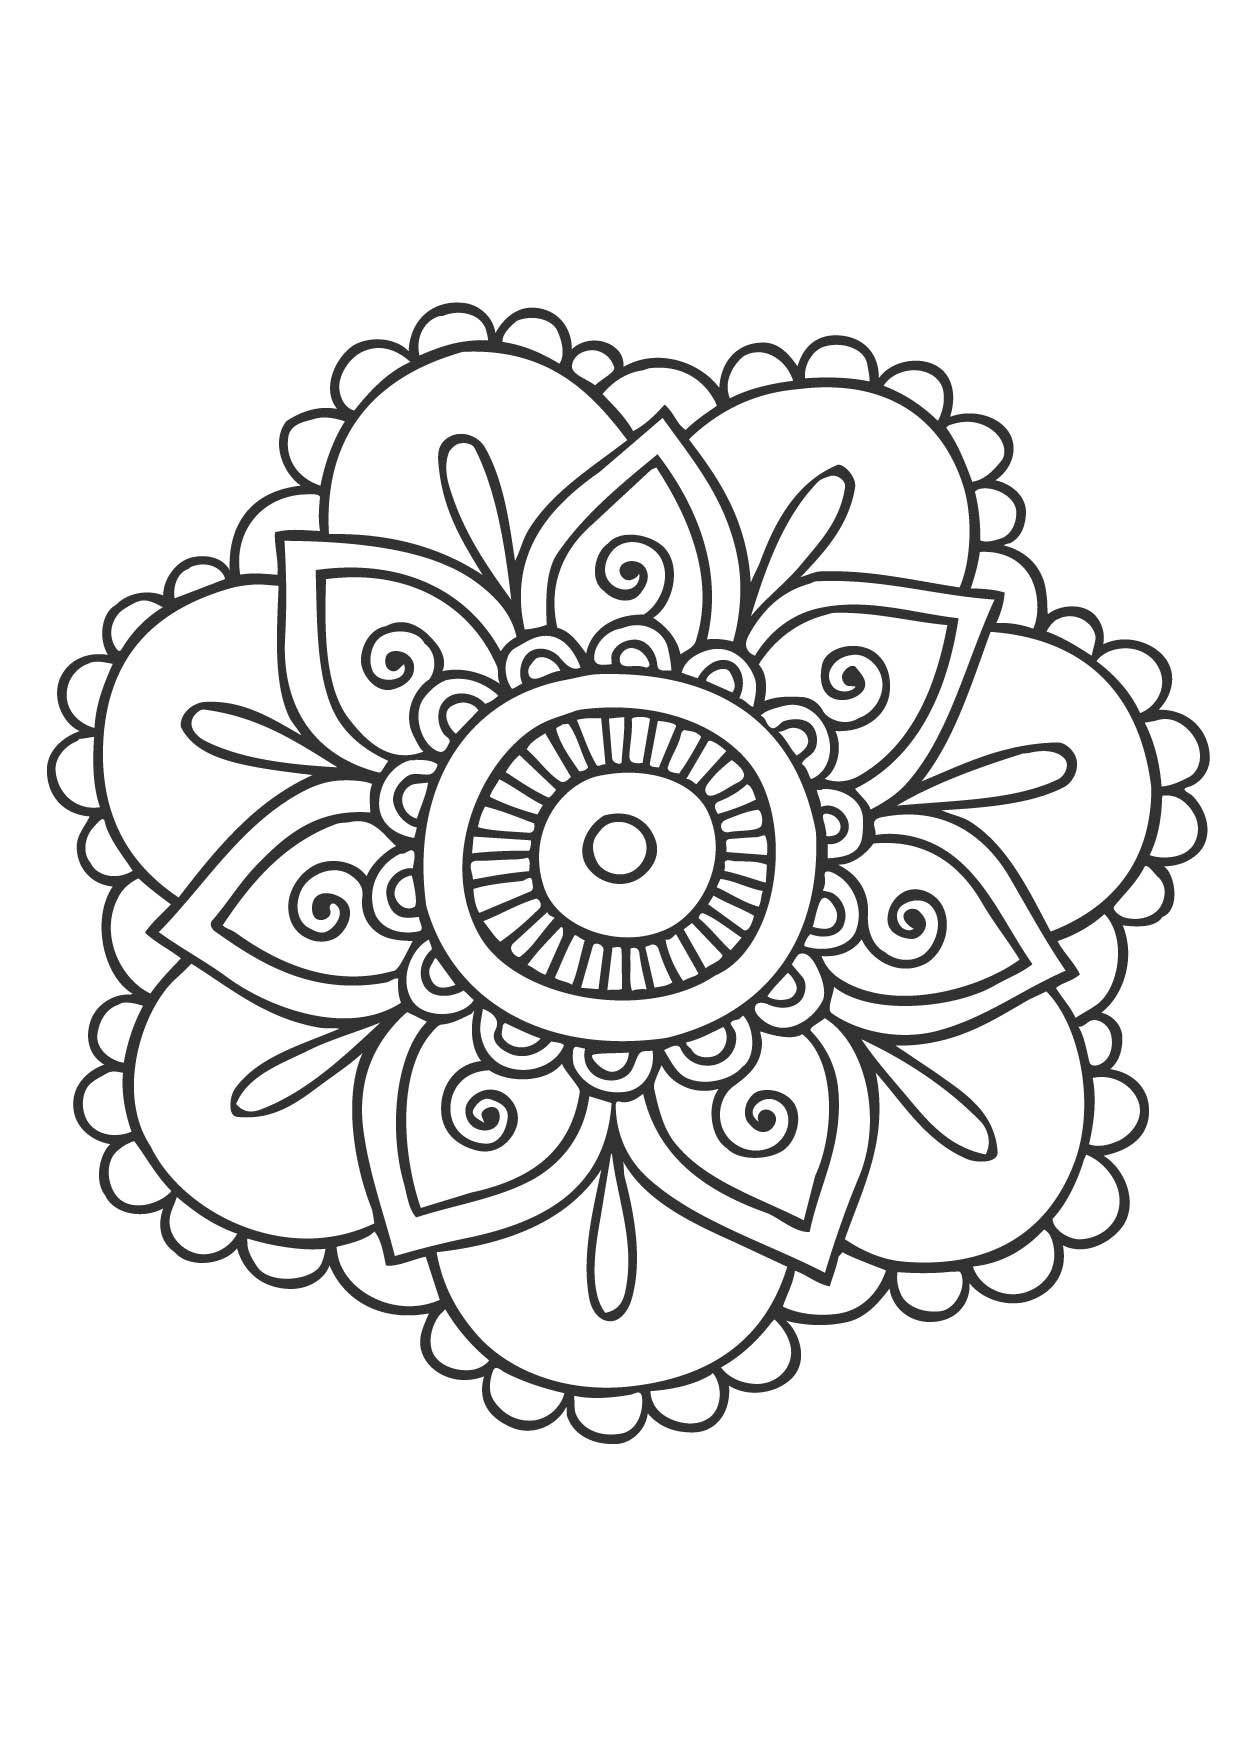 Coloriage Mandala fleur 2 - Coloriage Mandalas ...